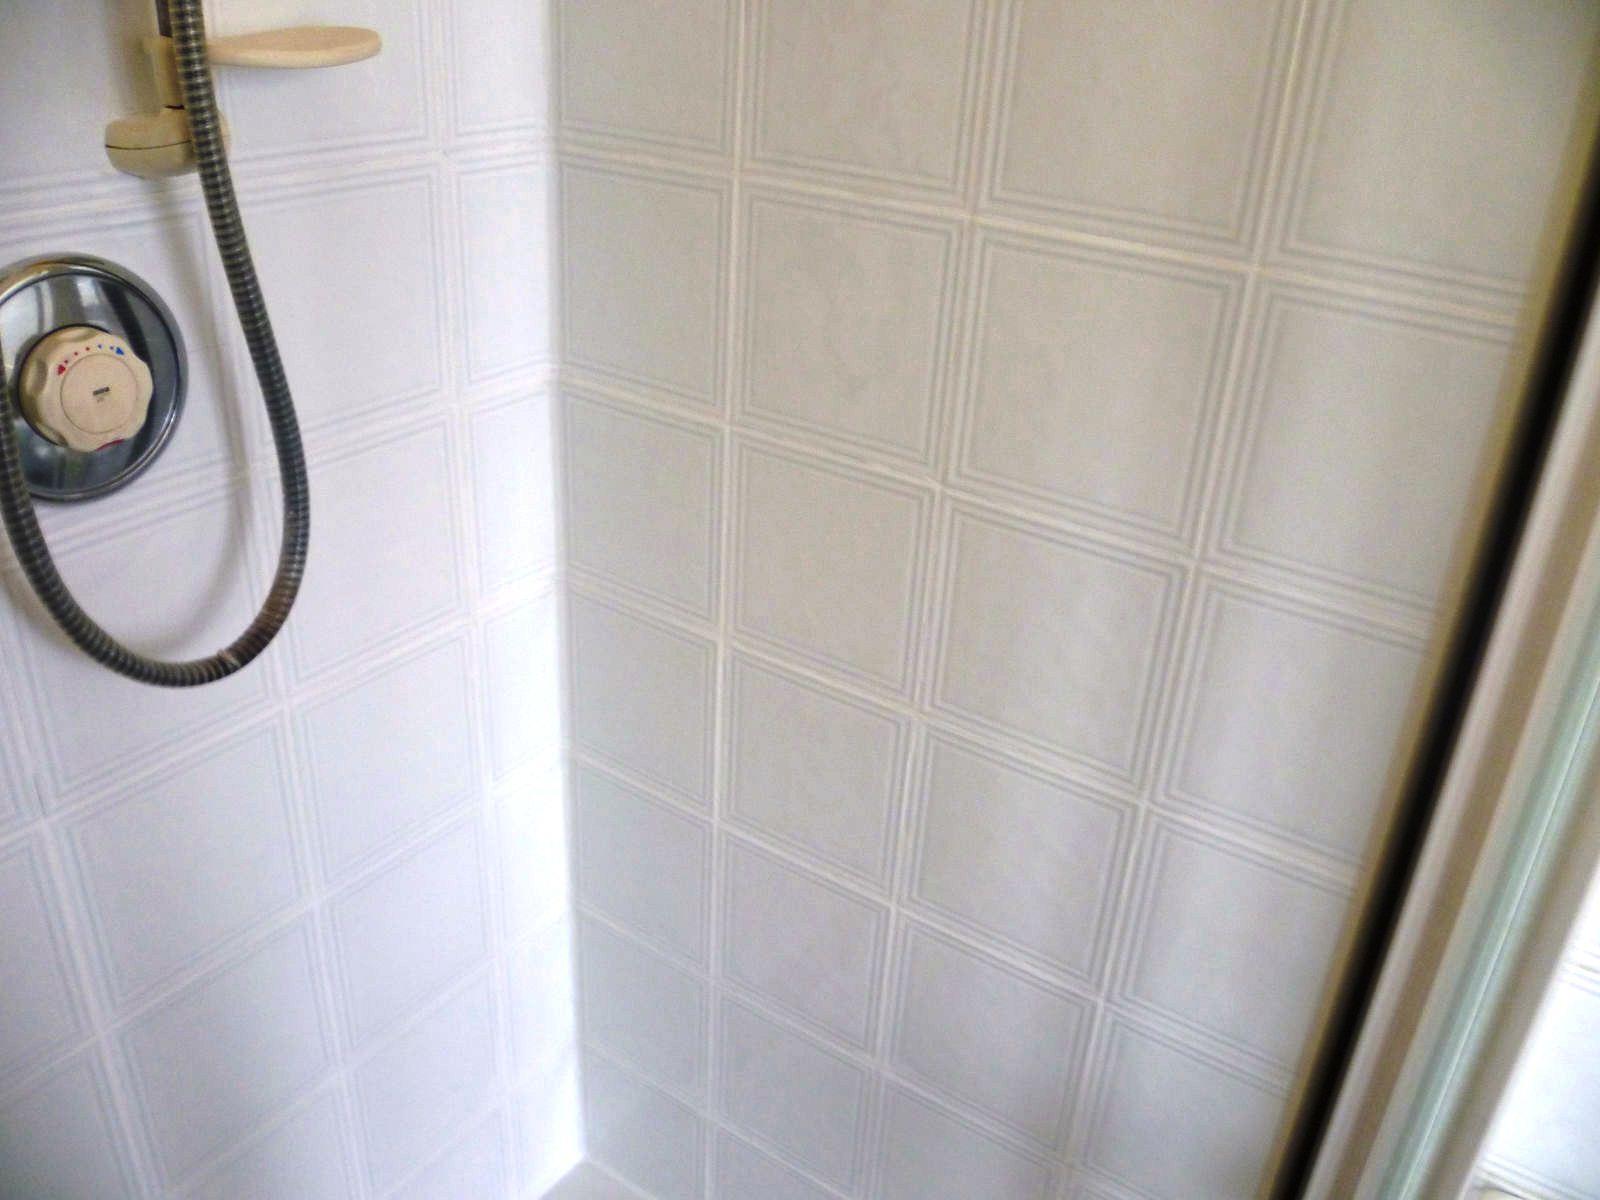 Gruby Ceramic Tiled Shower in Bishopton After